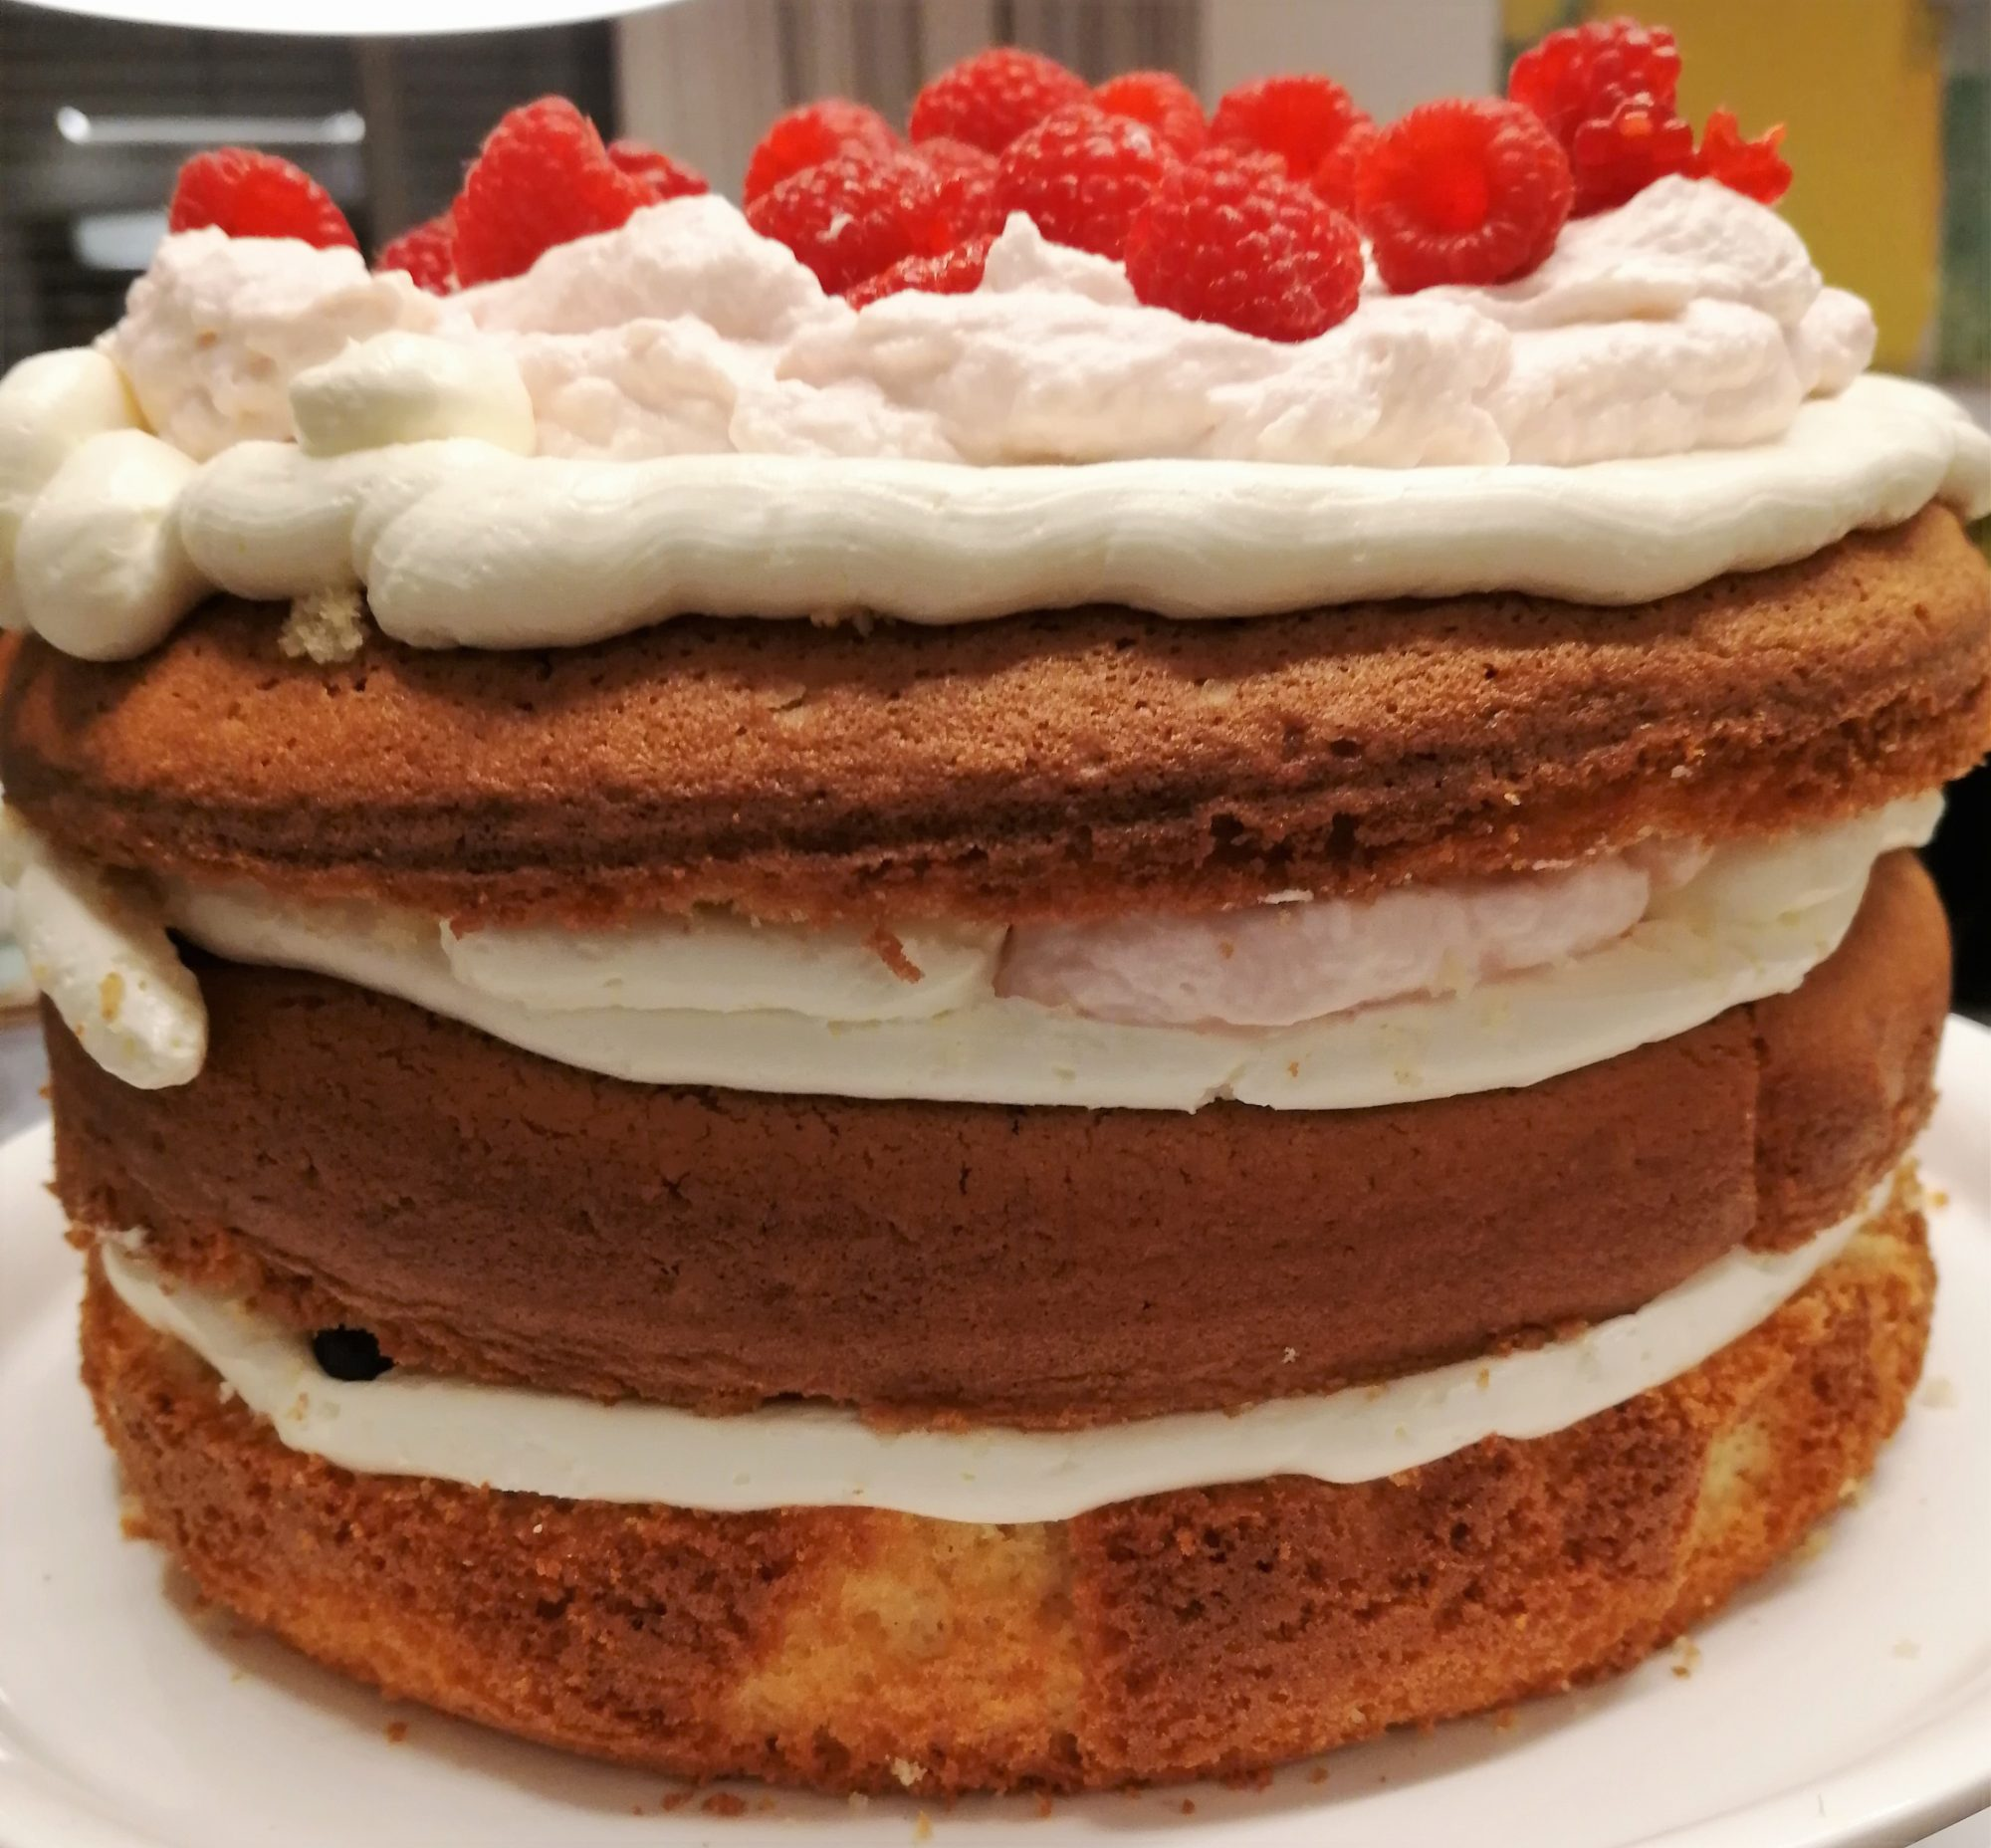 Semi Naked Cake stapeln mit Swiss Meringue Buttercreme